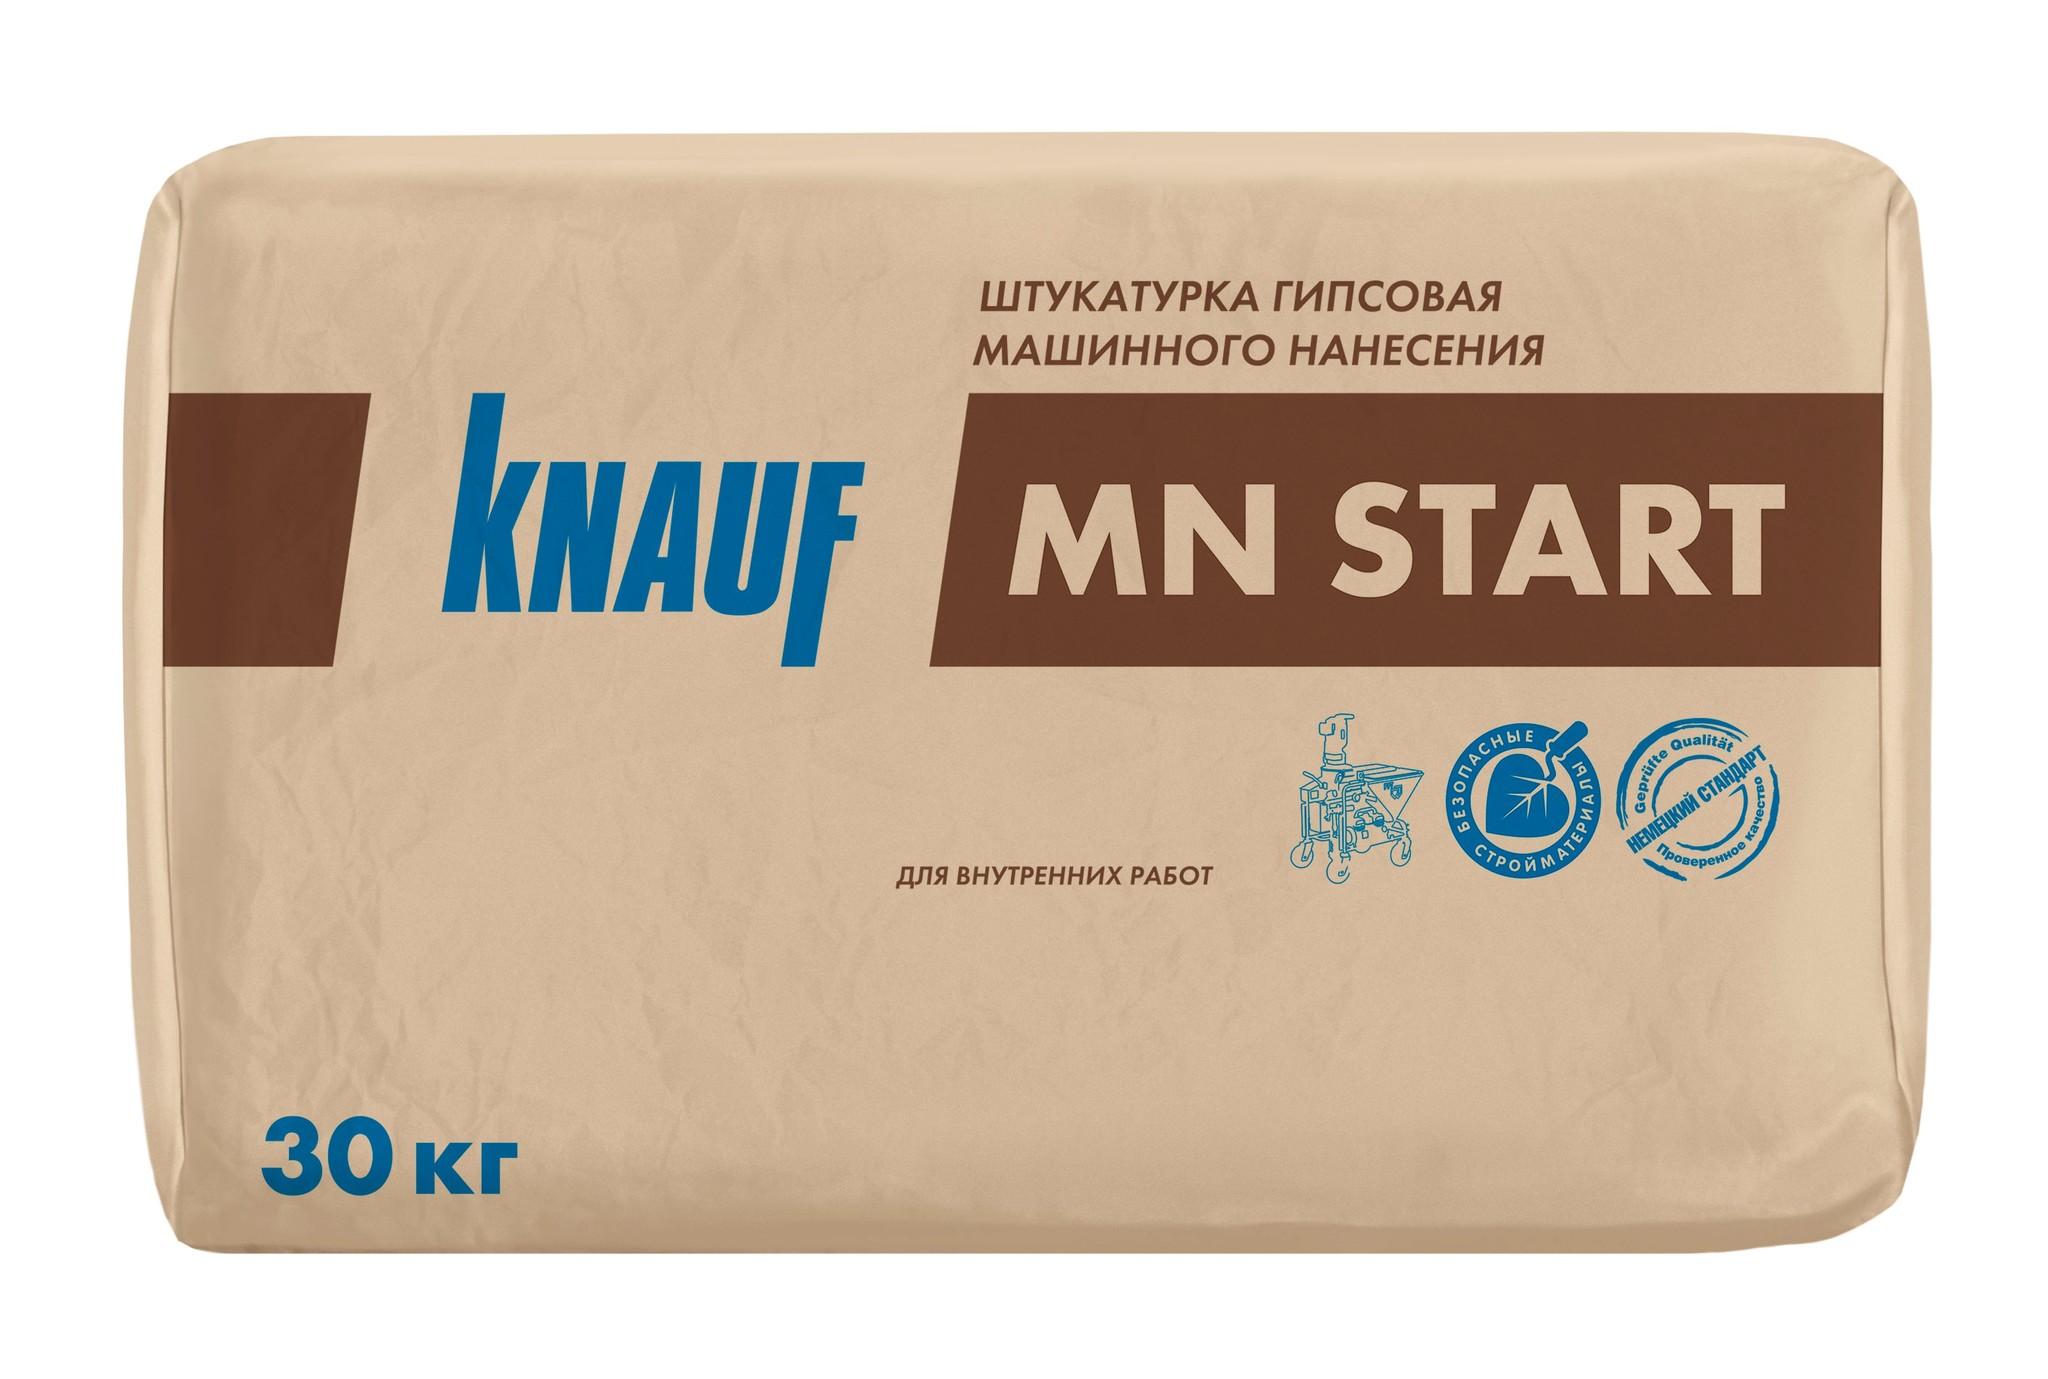 Штукатурки Гипсовая штукатурка Knauf МН Старт для машинного нанесения, 30 кг 682b100ae79048b487a9fd5da2e4e12b.jpg